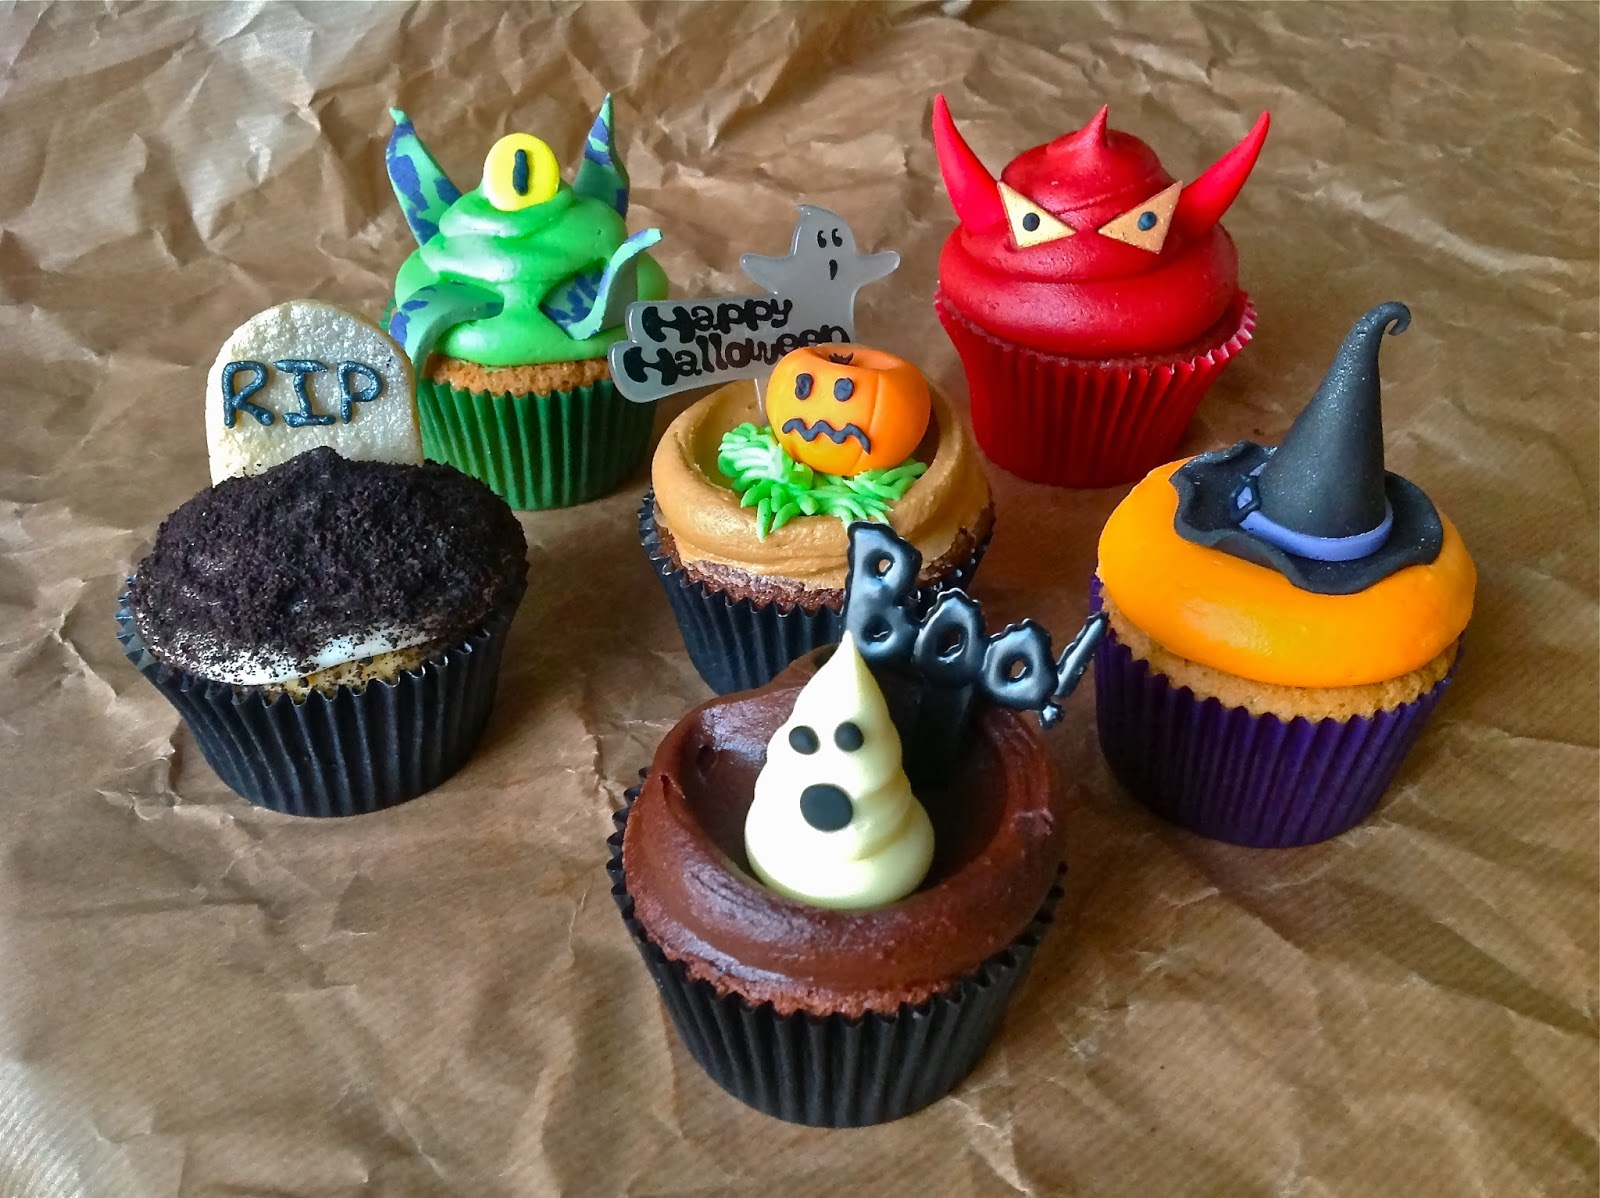 Hd Wallpapers Blog Halloween Cupcakes